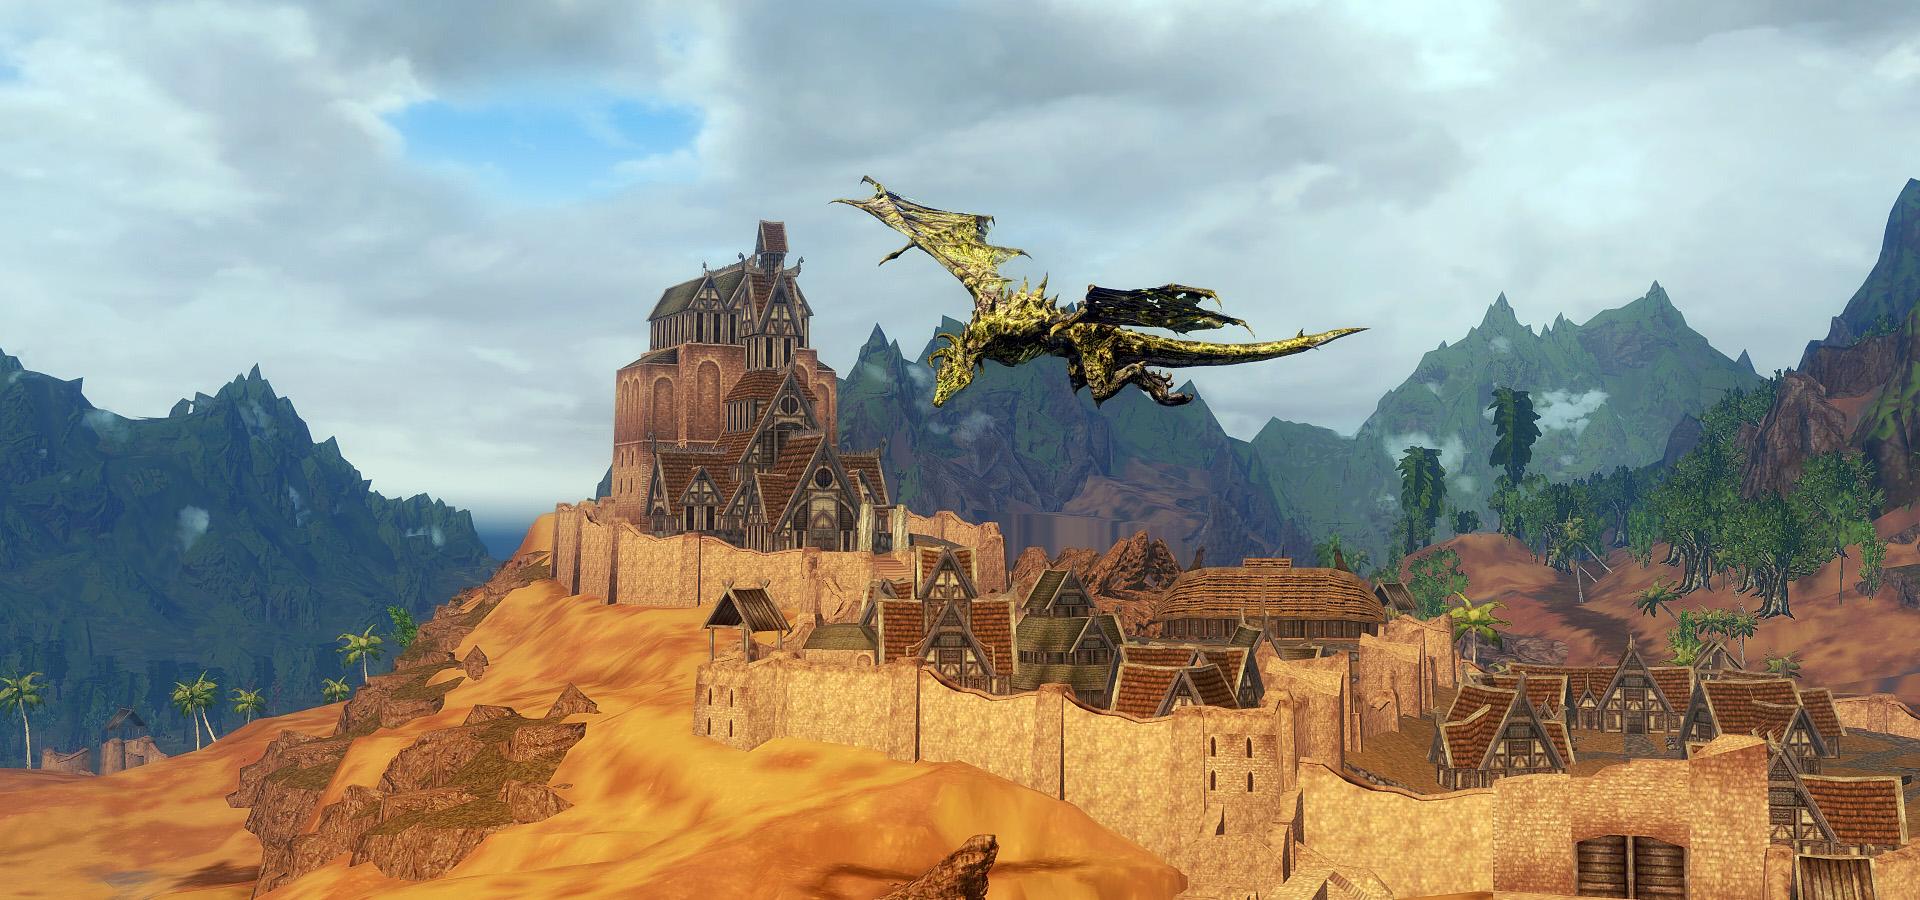 565. Дюрньевир около Вайтрана.jpg - Elder Scrolls 5: Skyrim, the CBBE, Сборка-21